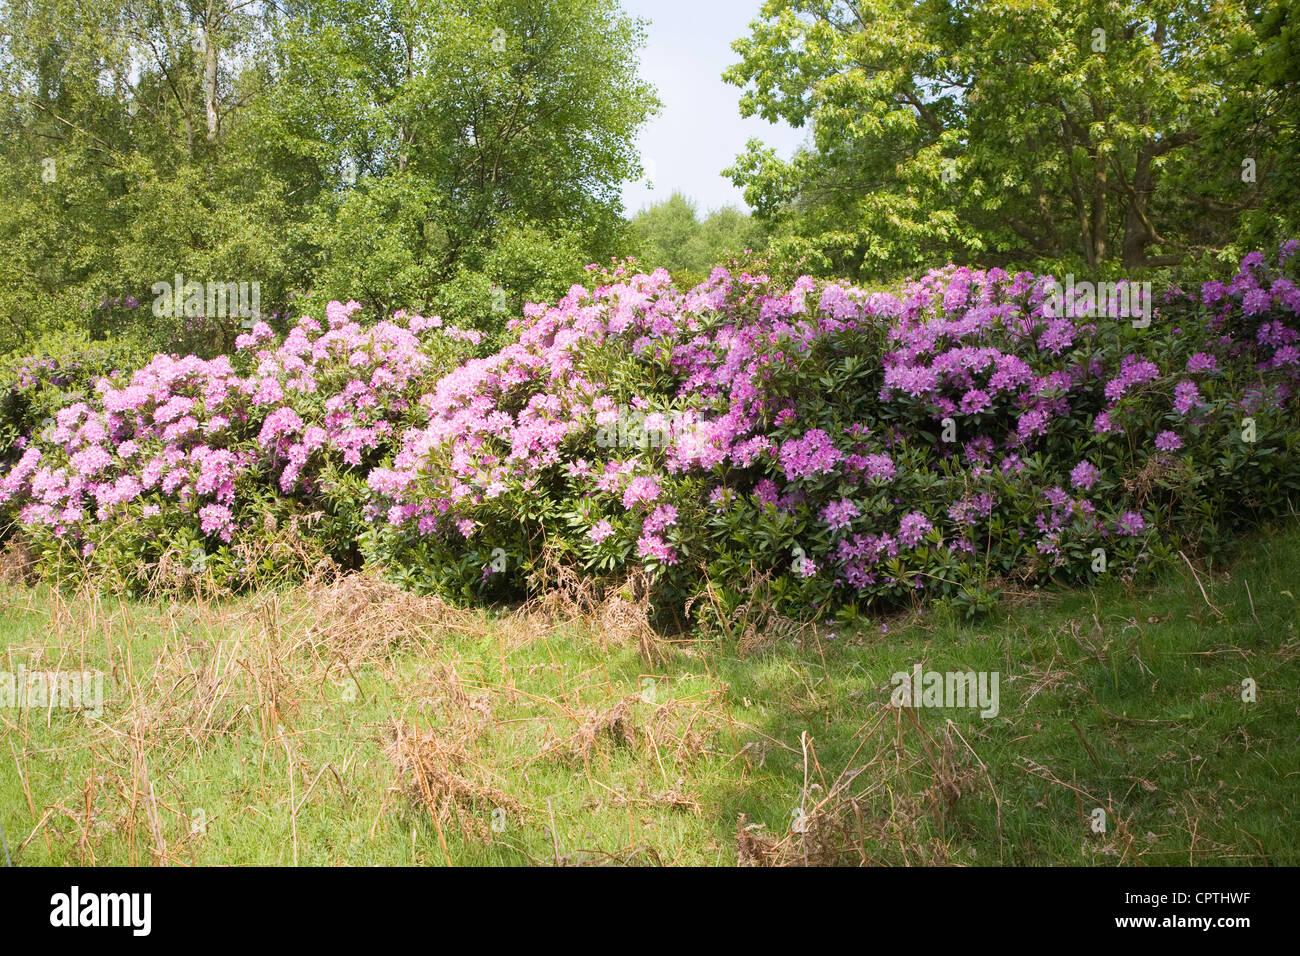 Purple Rhododendron flowers growing wild on Sutton Heath, Suffolk, England - Stock Image